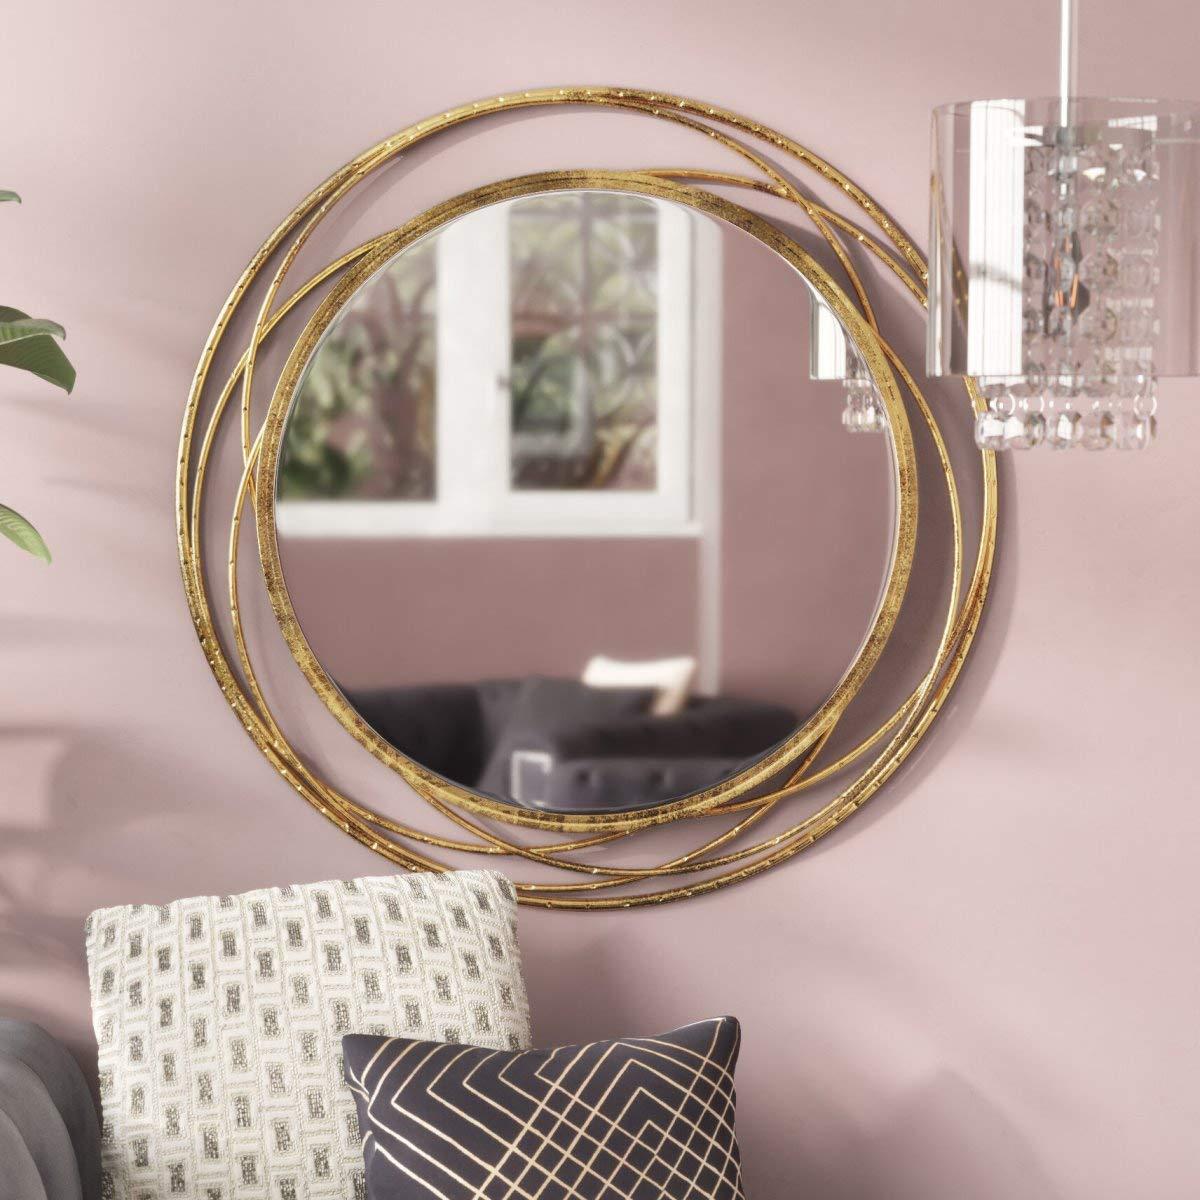 SPAZIO Swirl Wall Mirror, One Size, Antique Gold by SPAZIO